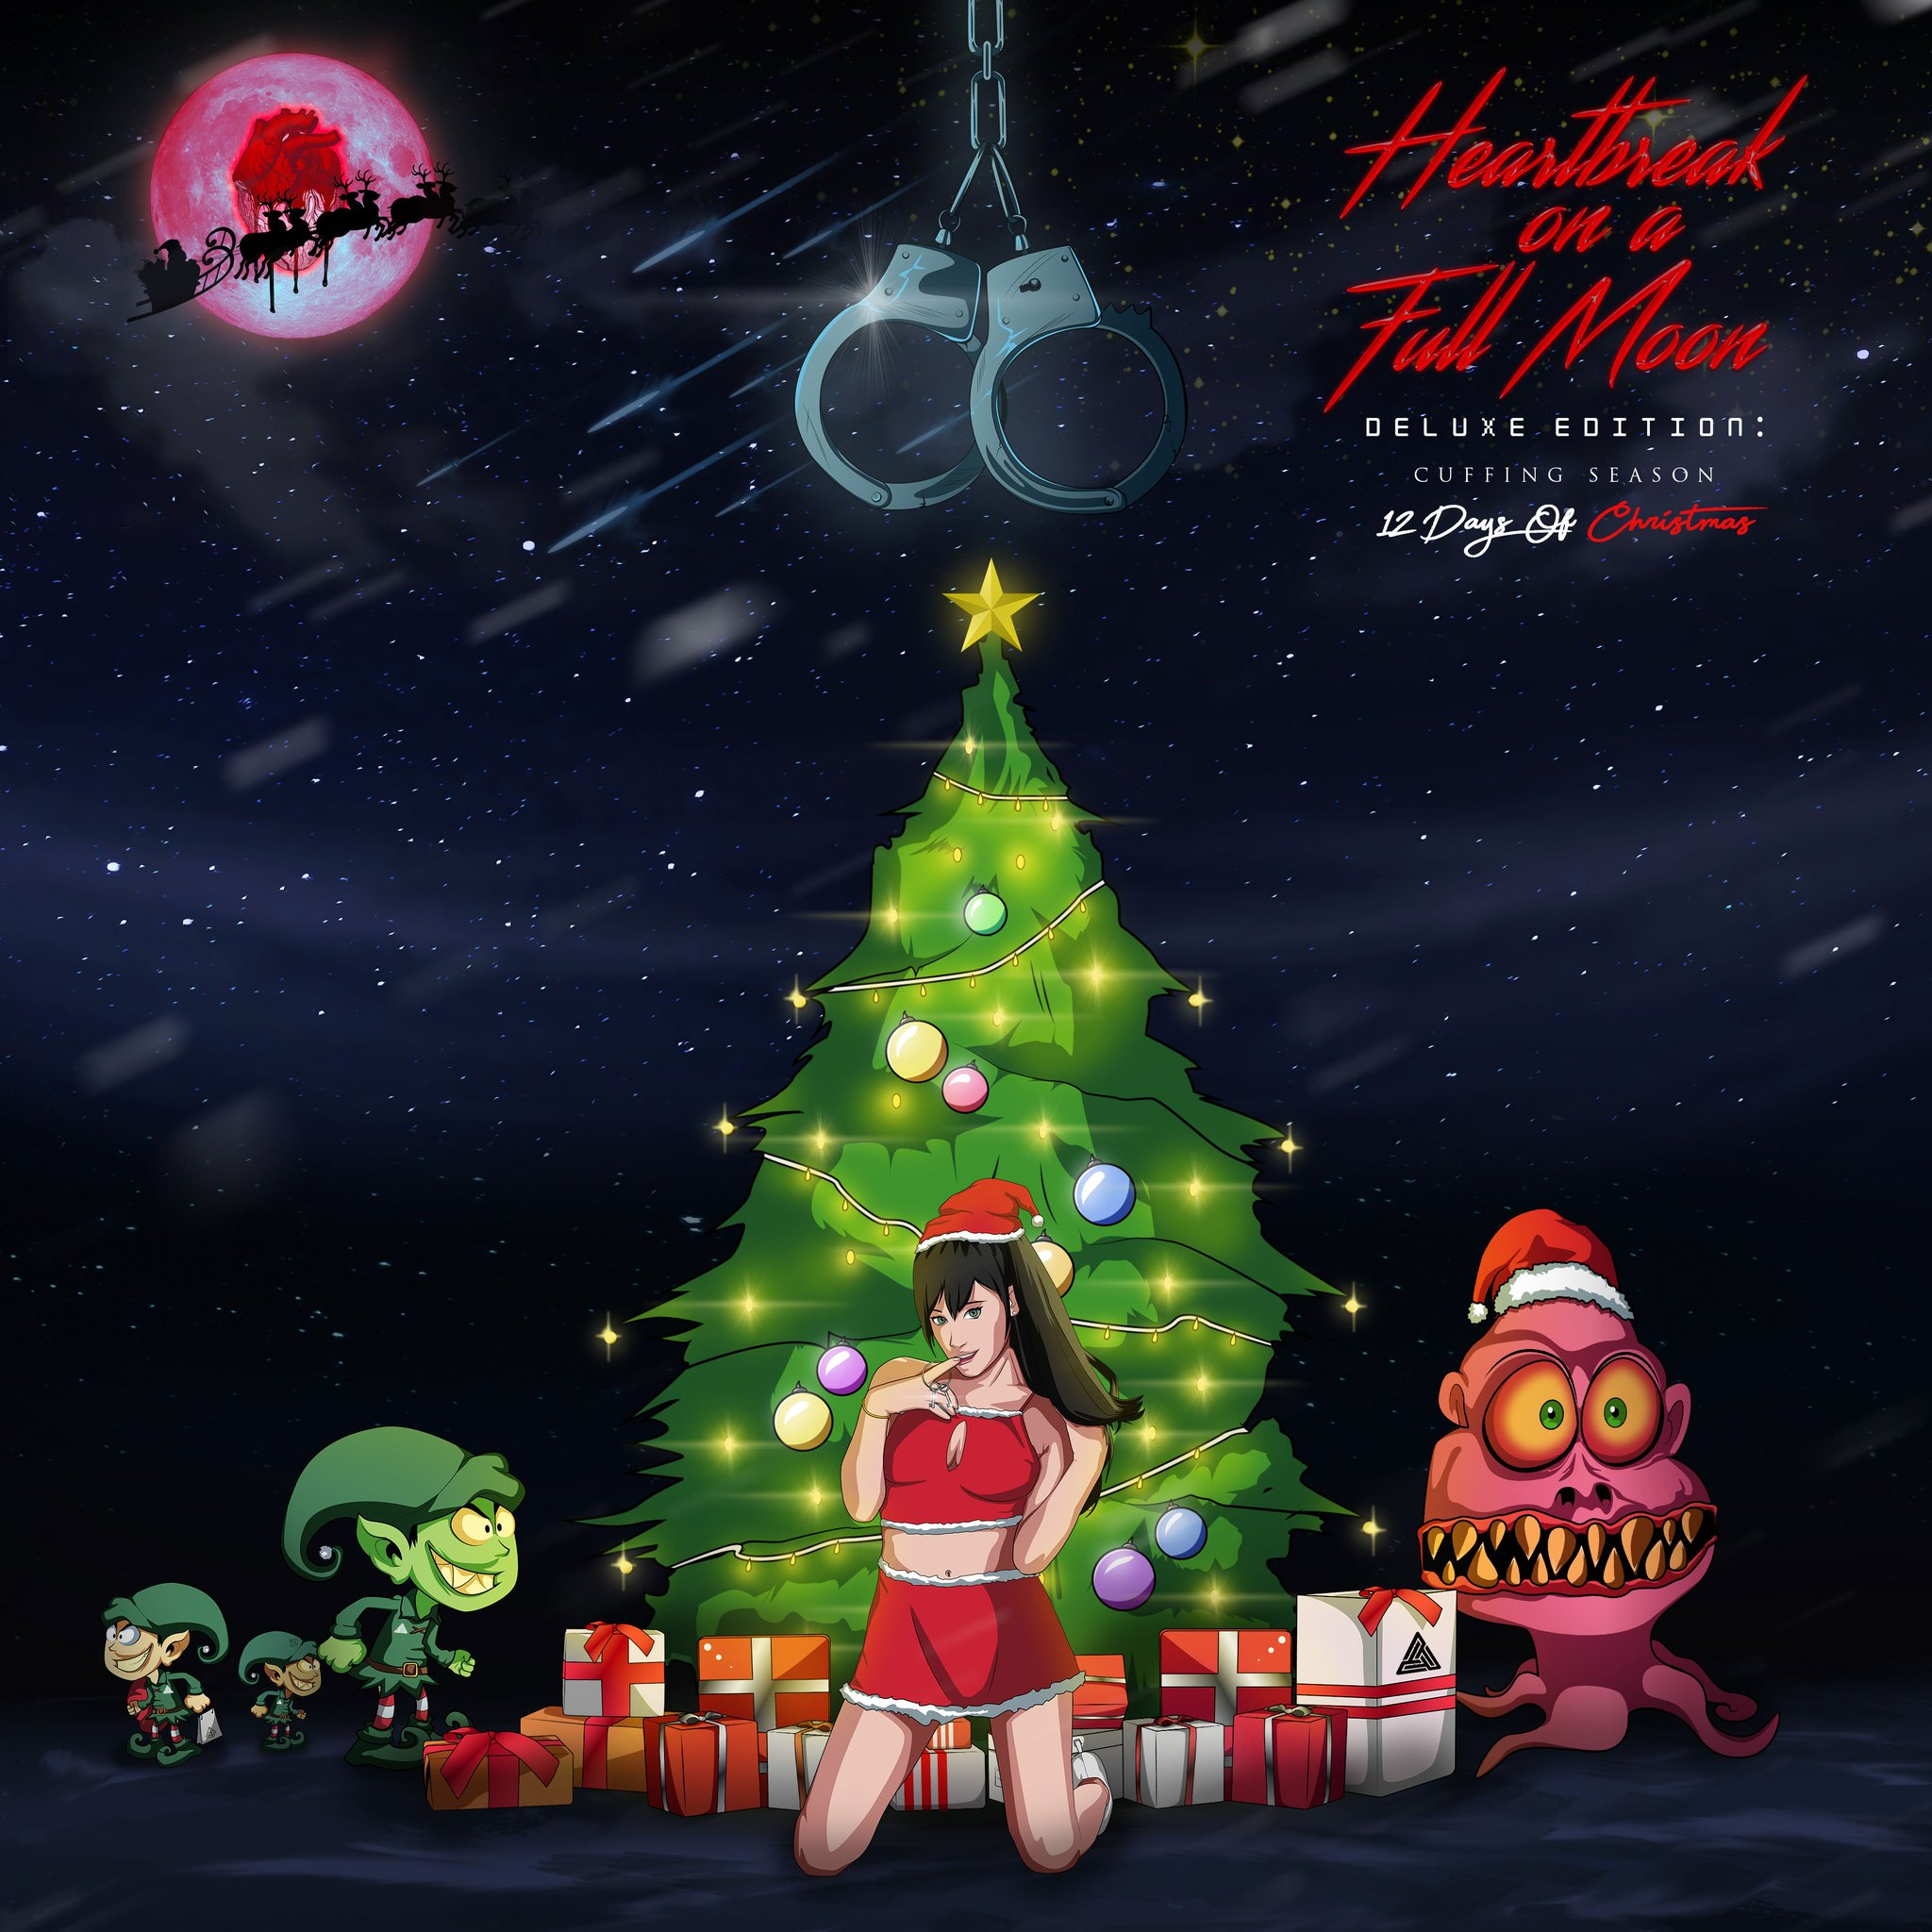 Stream 12 Days Of Christmas: CUFFING SEASON on @Spotify �� �� ❤️ https://t.co/O478P4fTEz https://t.co/t1WAY6n5Jc